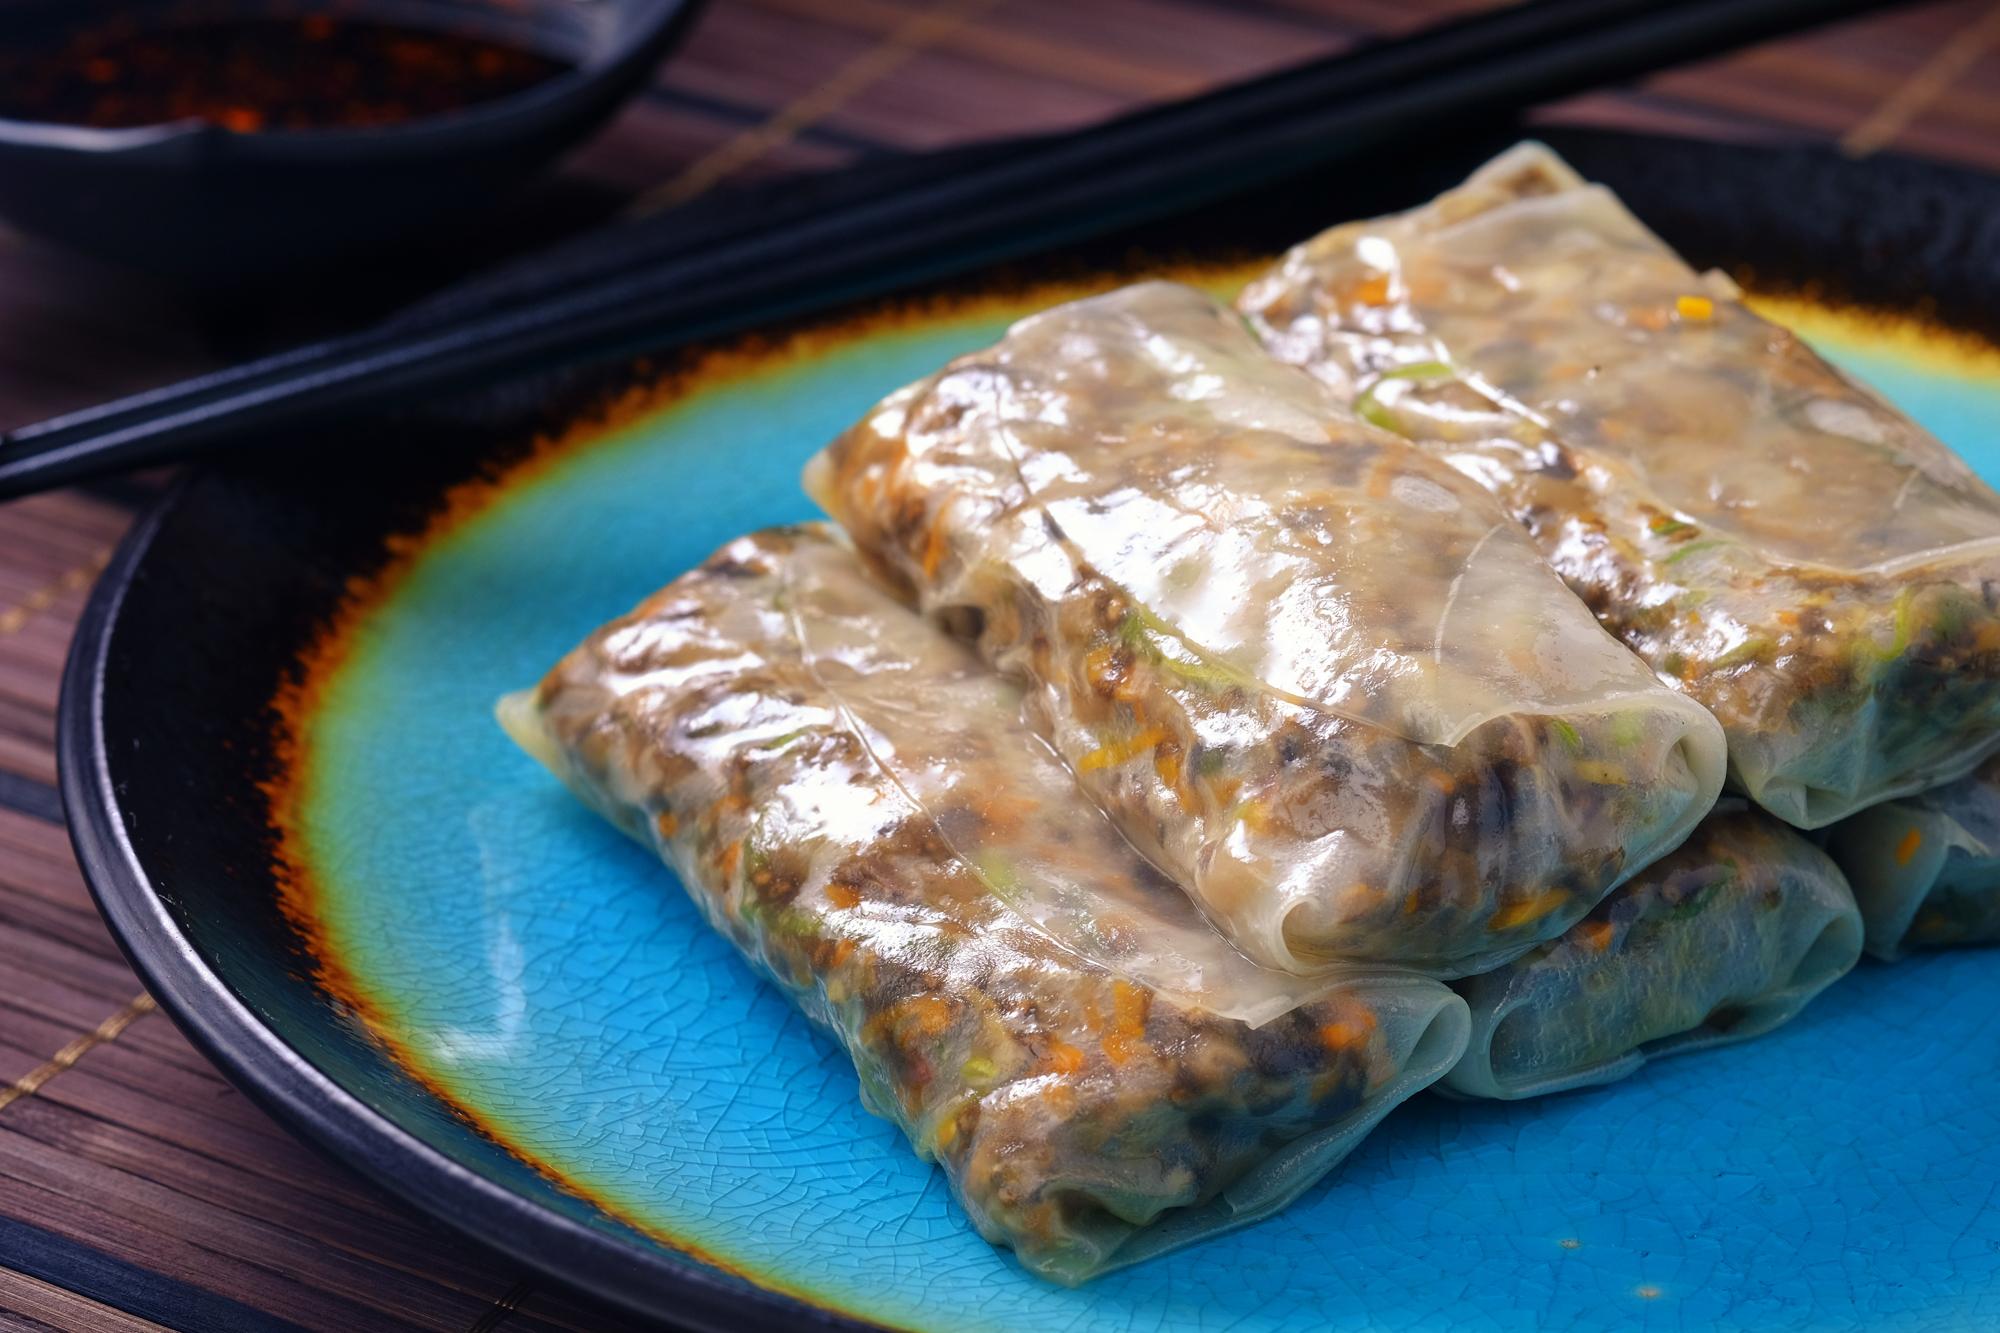 Vegan Gluten-Free Dumplings